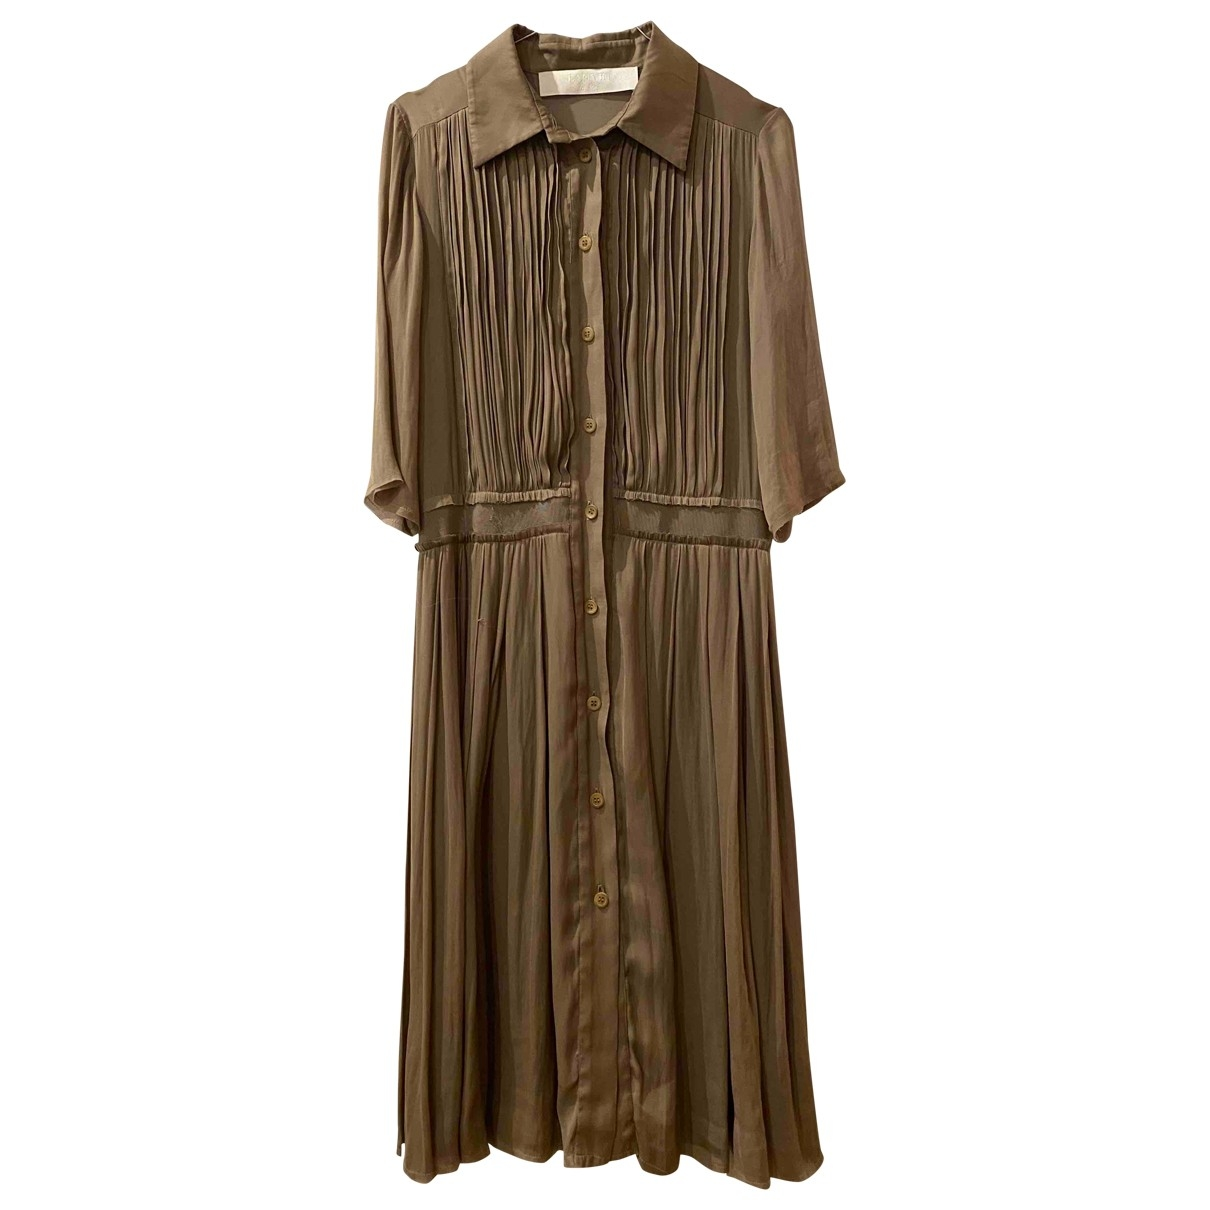 Lanvin \N Kleid in  Beige Polyester